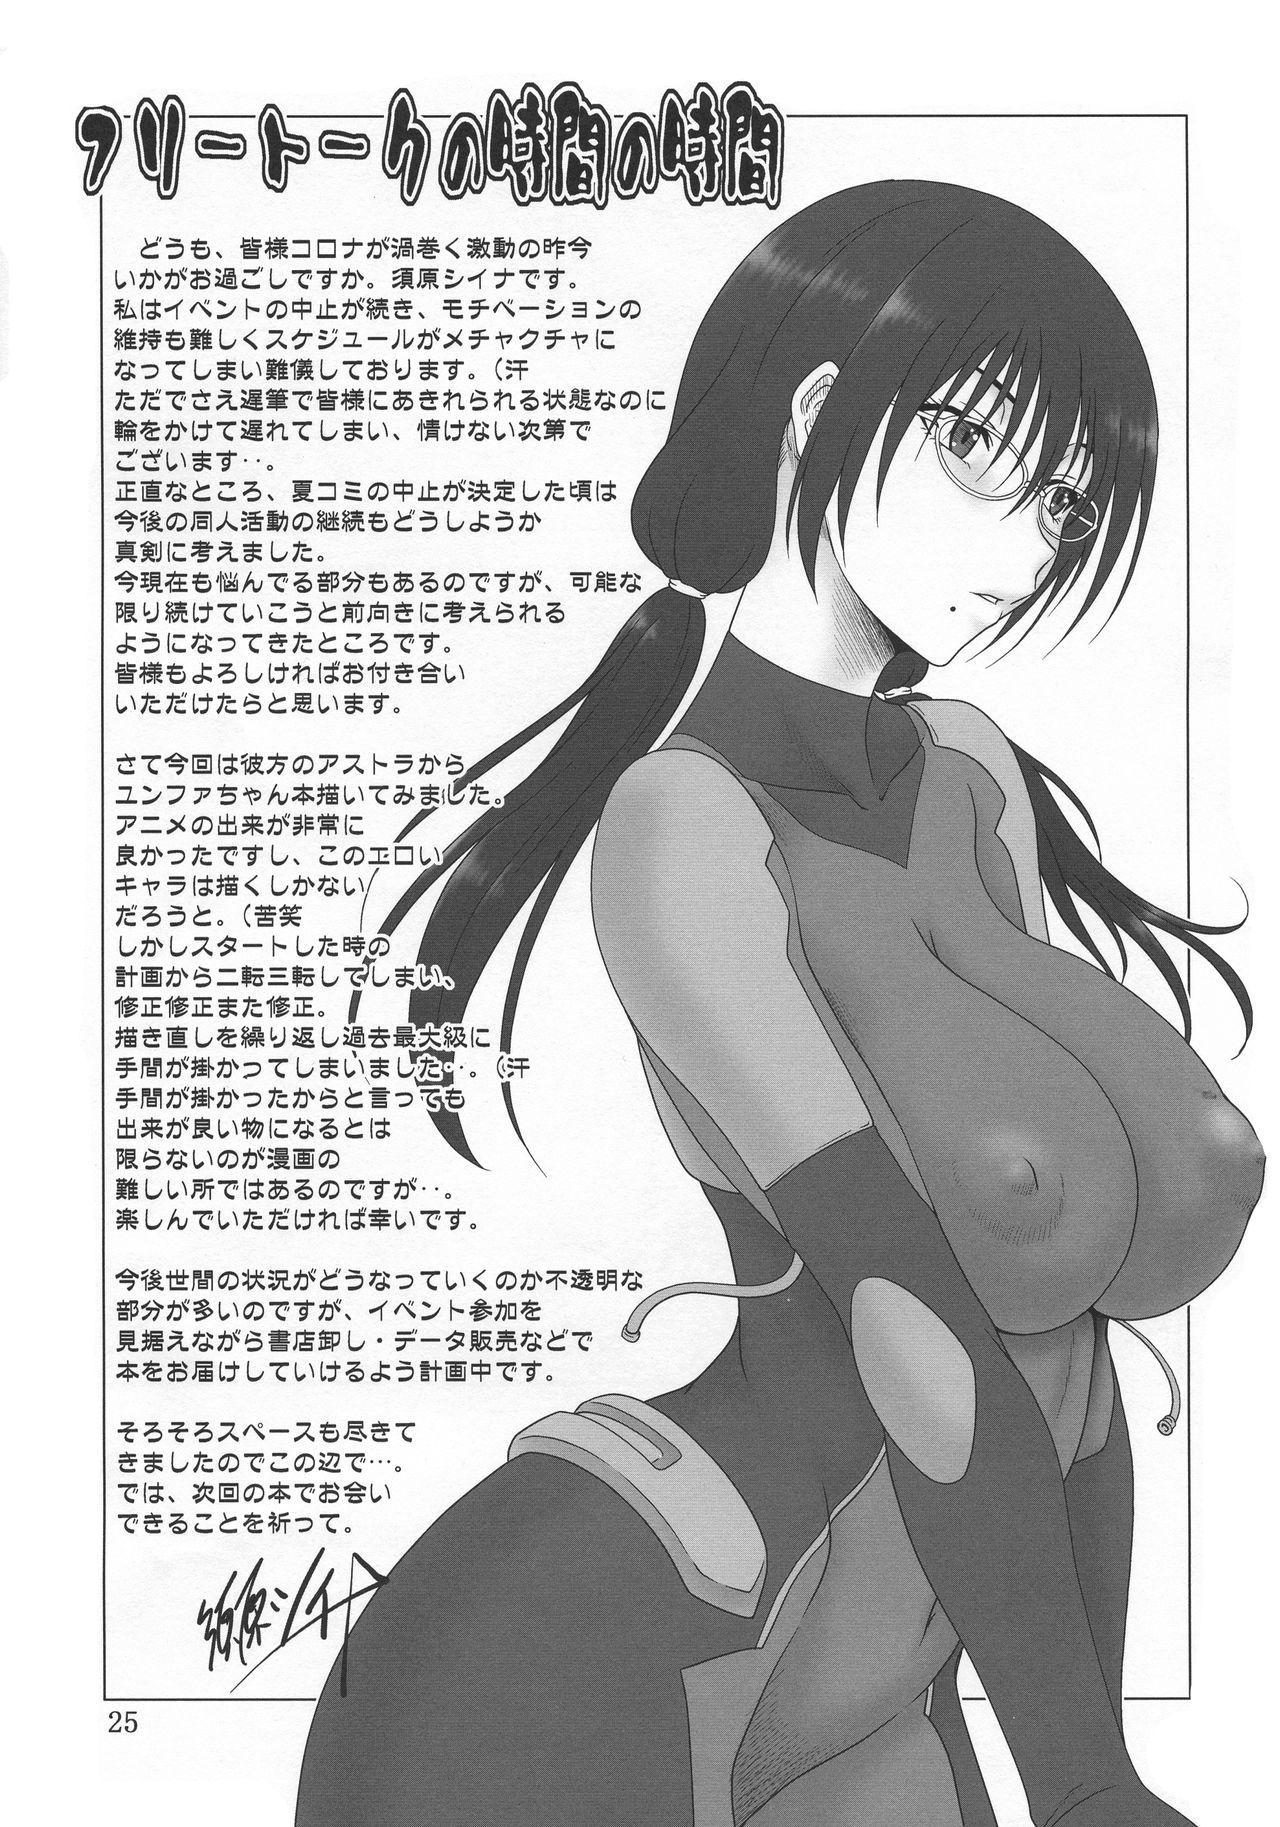 Kyuukyou no Wakusei - Planet of plight 23